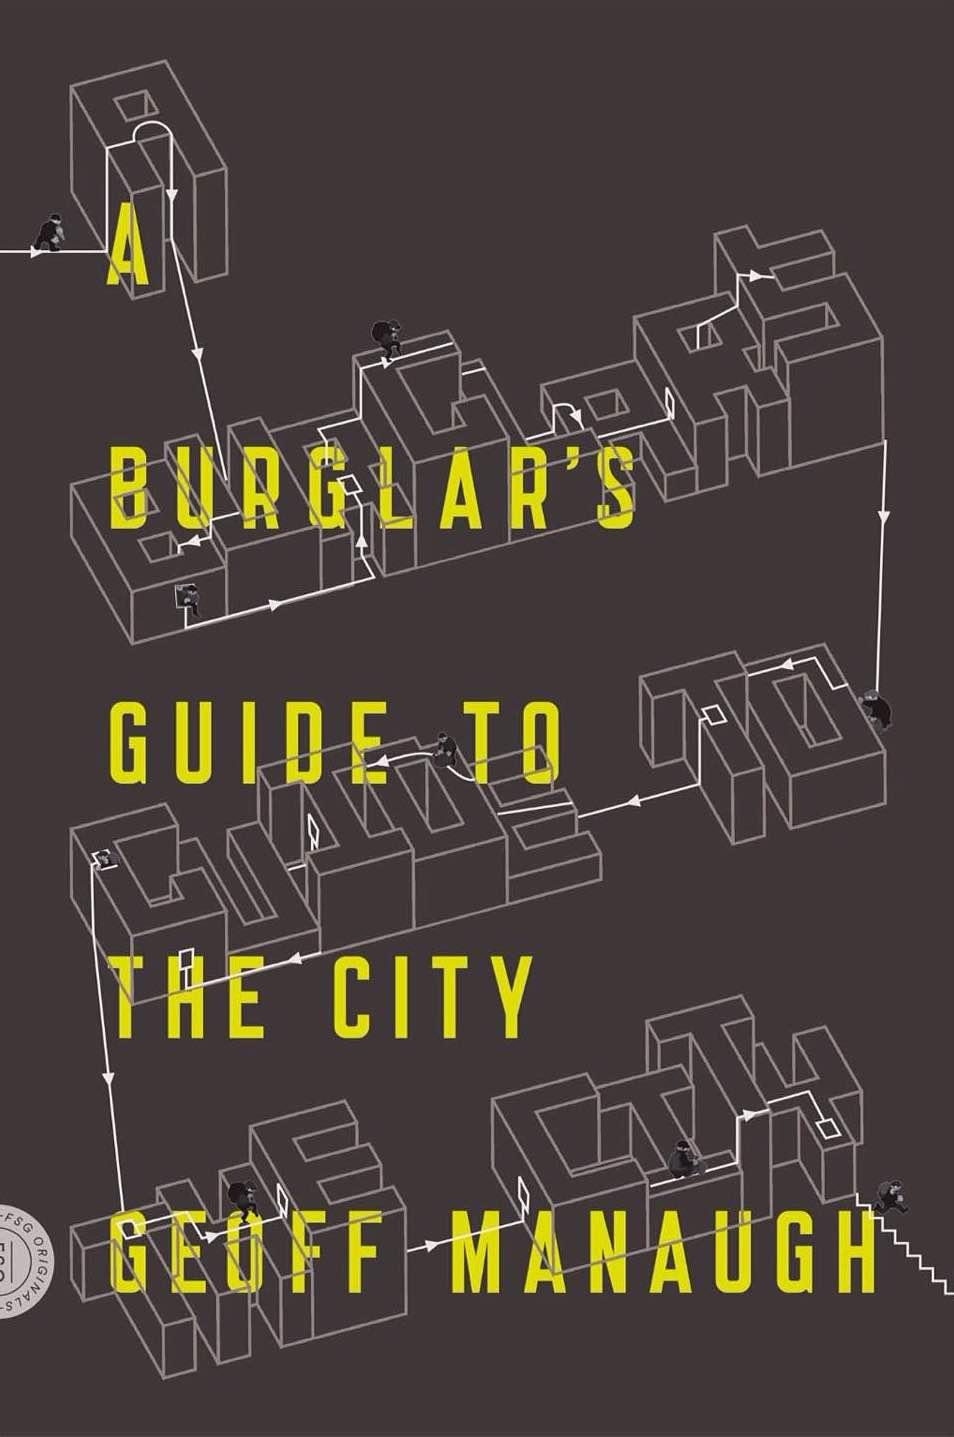 Review a burglars guide to the city burglars guideeg malvernweather Gallery